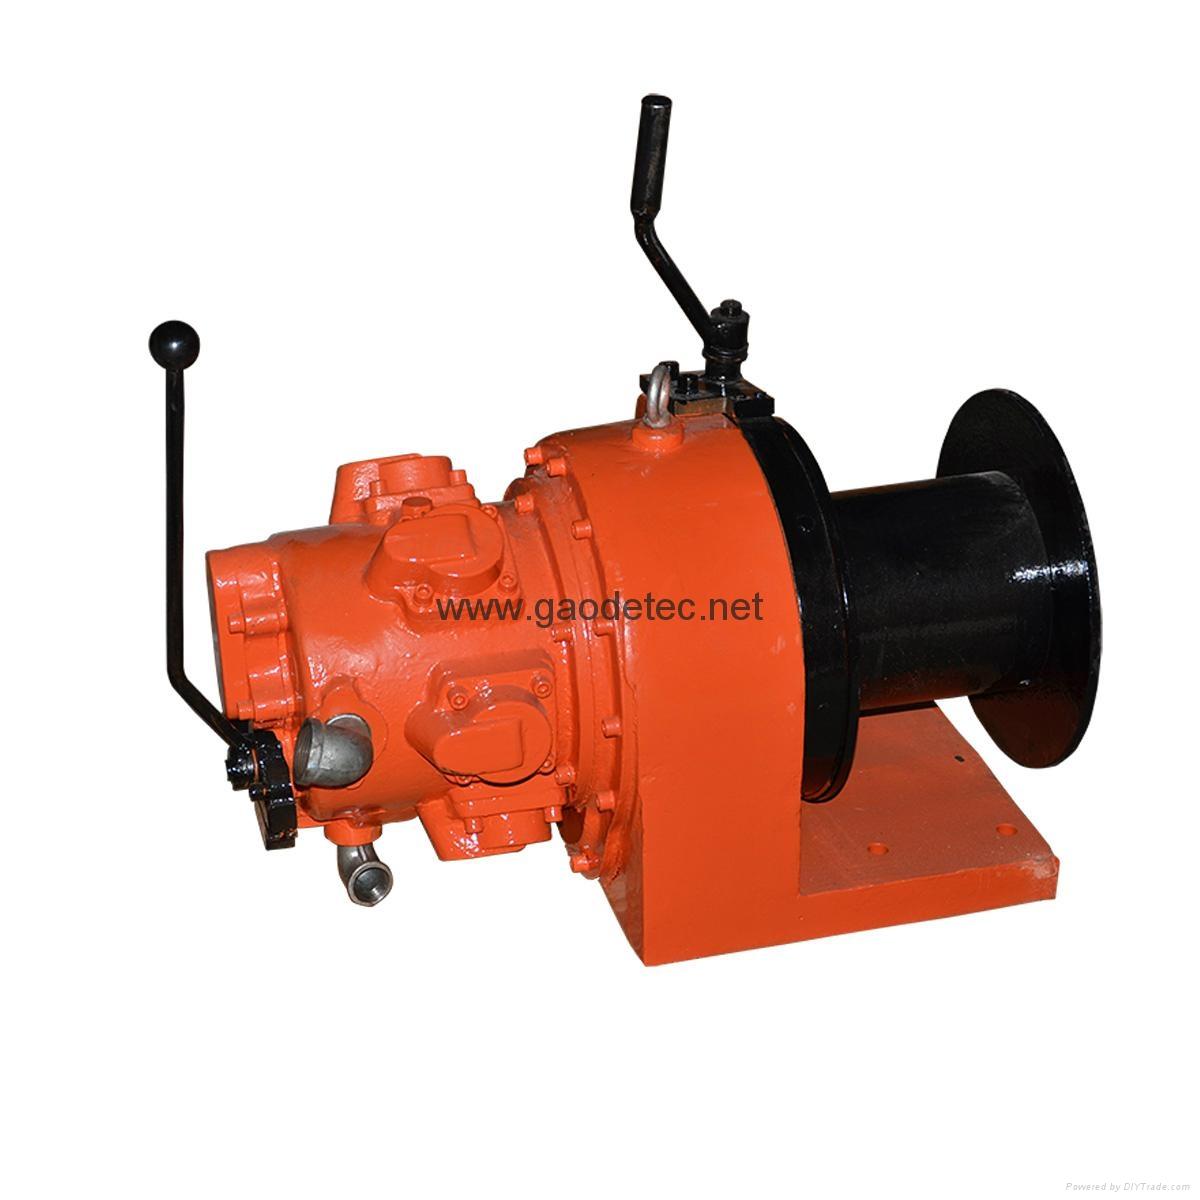 1 ton piston air winch